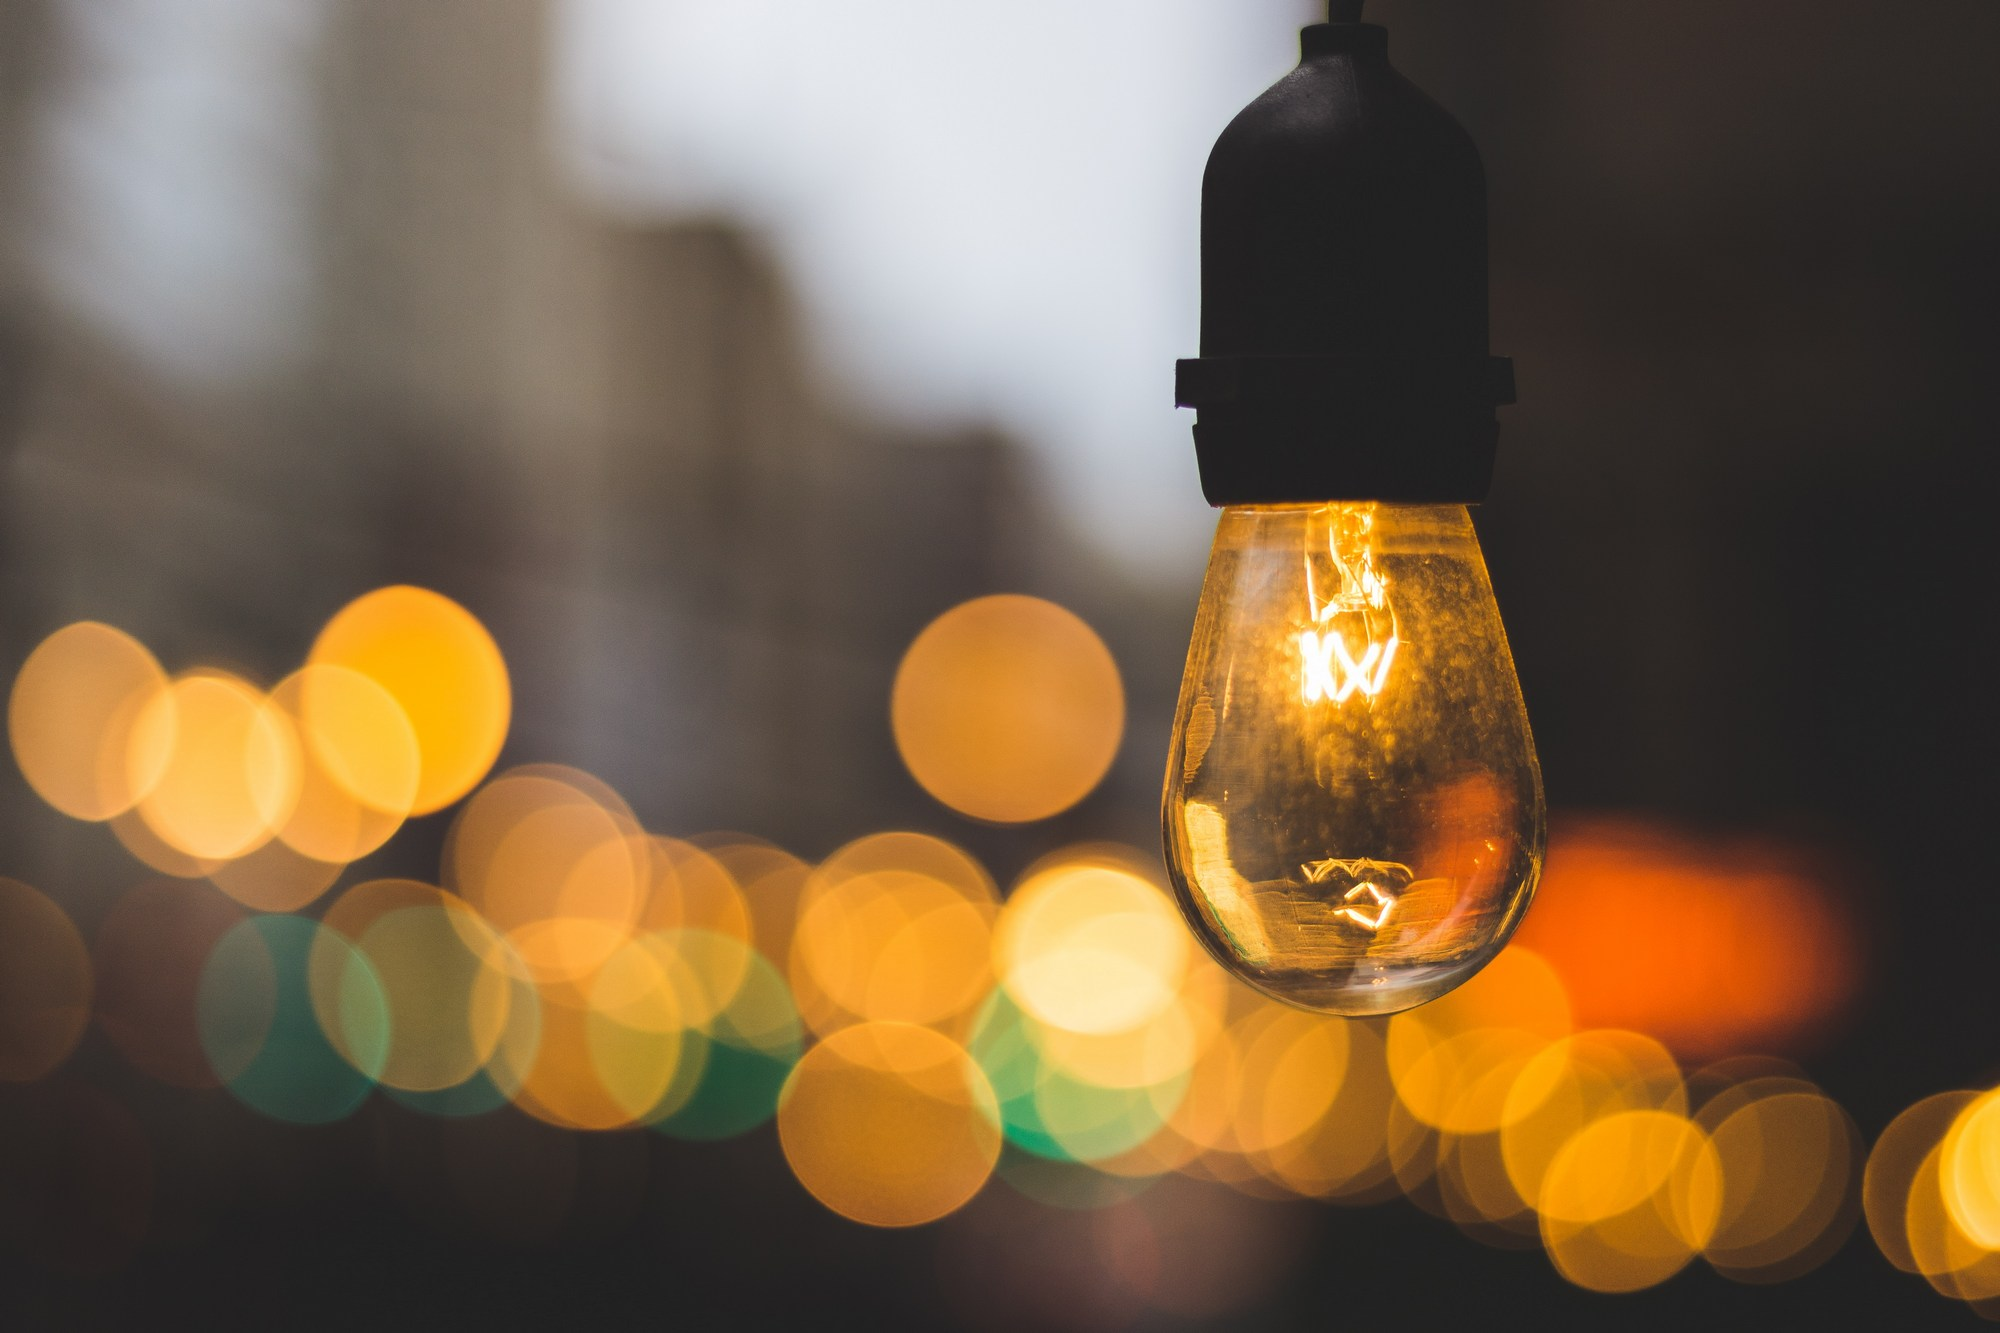 electricity/bulb